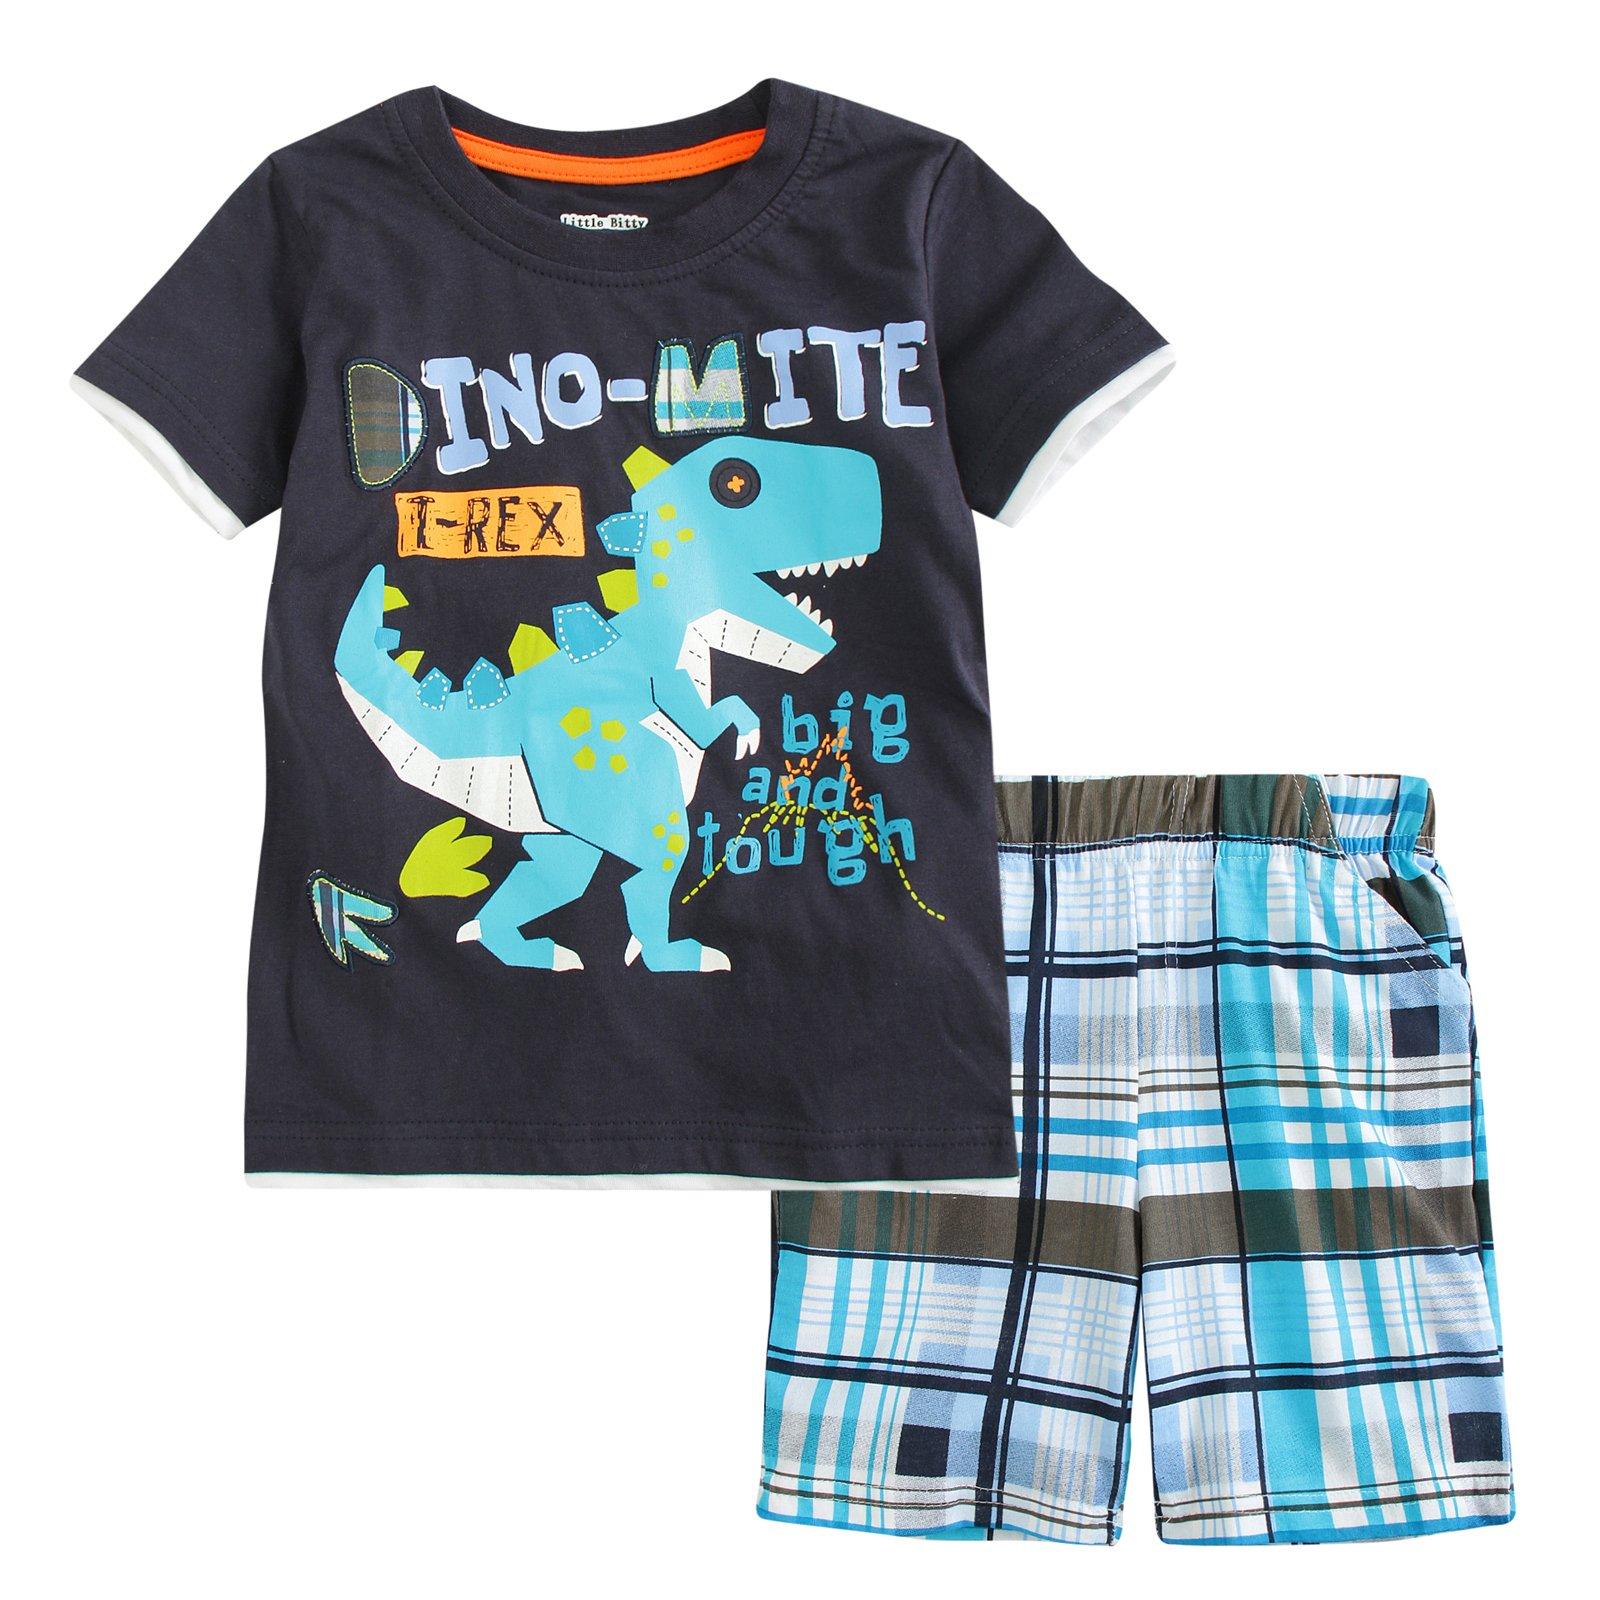 Little Bitty Little Boy Short Set Summer Cotton Clothing Set Shorts Set Black 2T